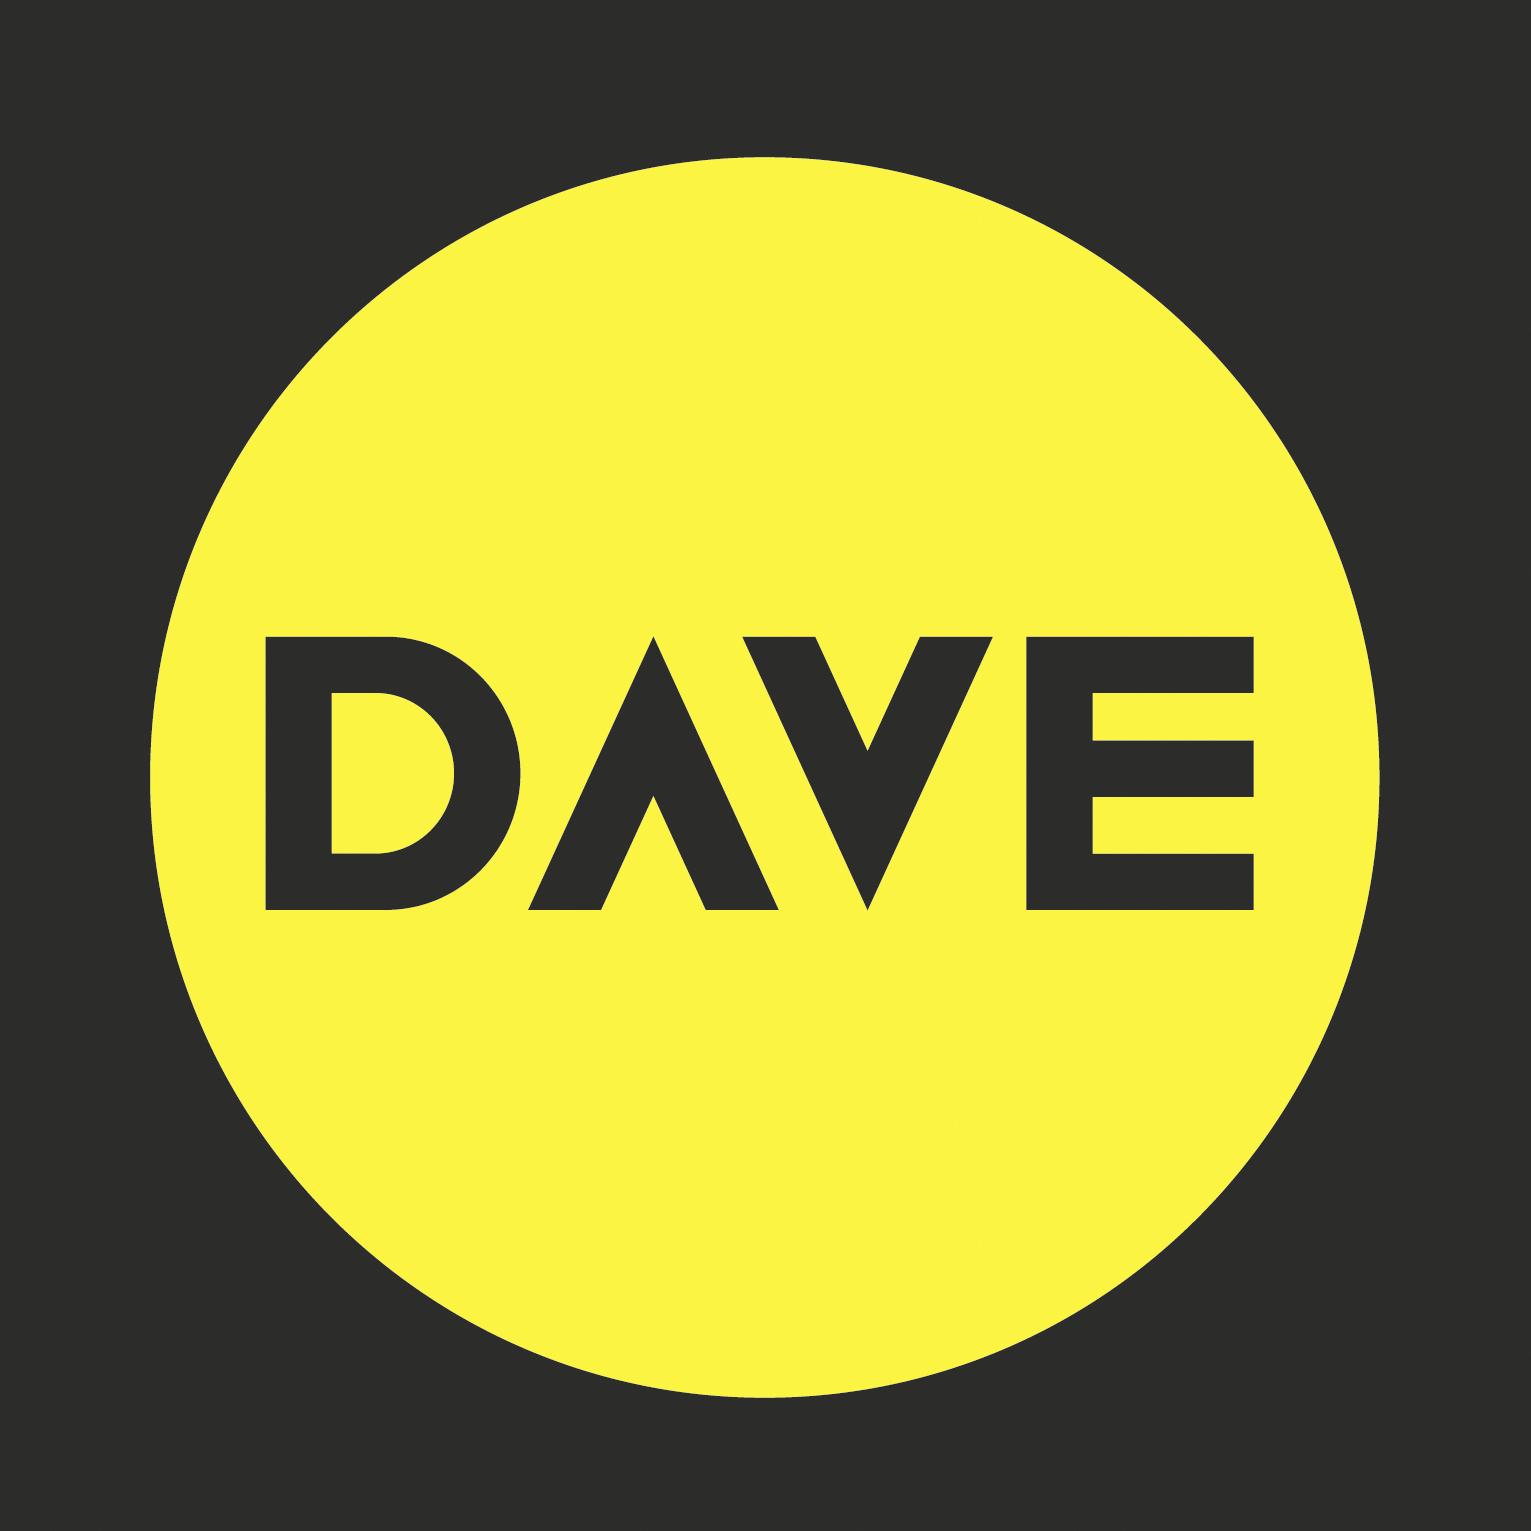 Dave Festival 18 27 Okt 2019